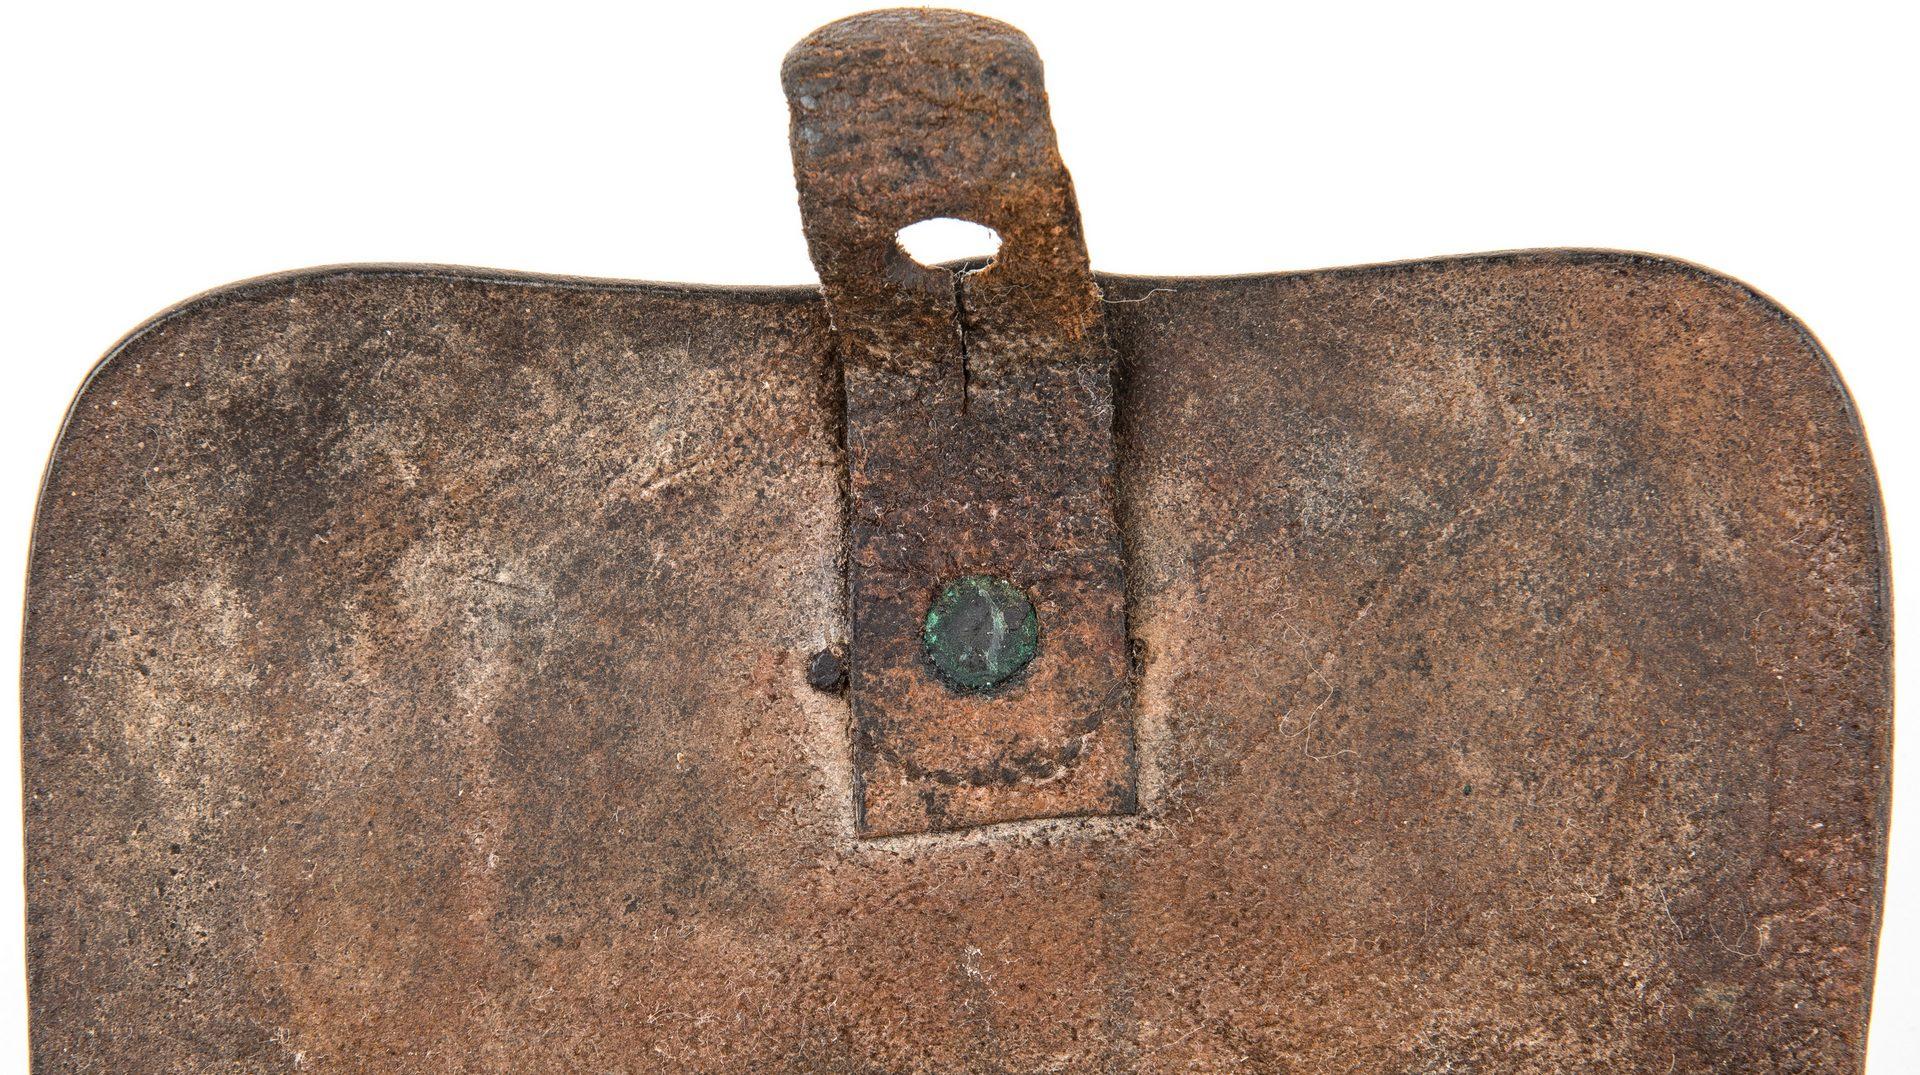 Lot 285: Confederate Arsenal Pistol Cartridge Box